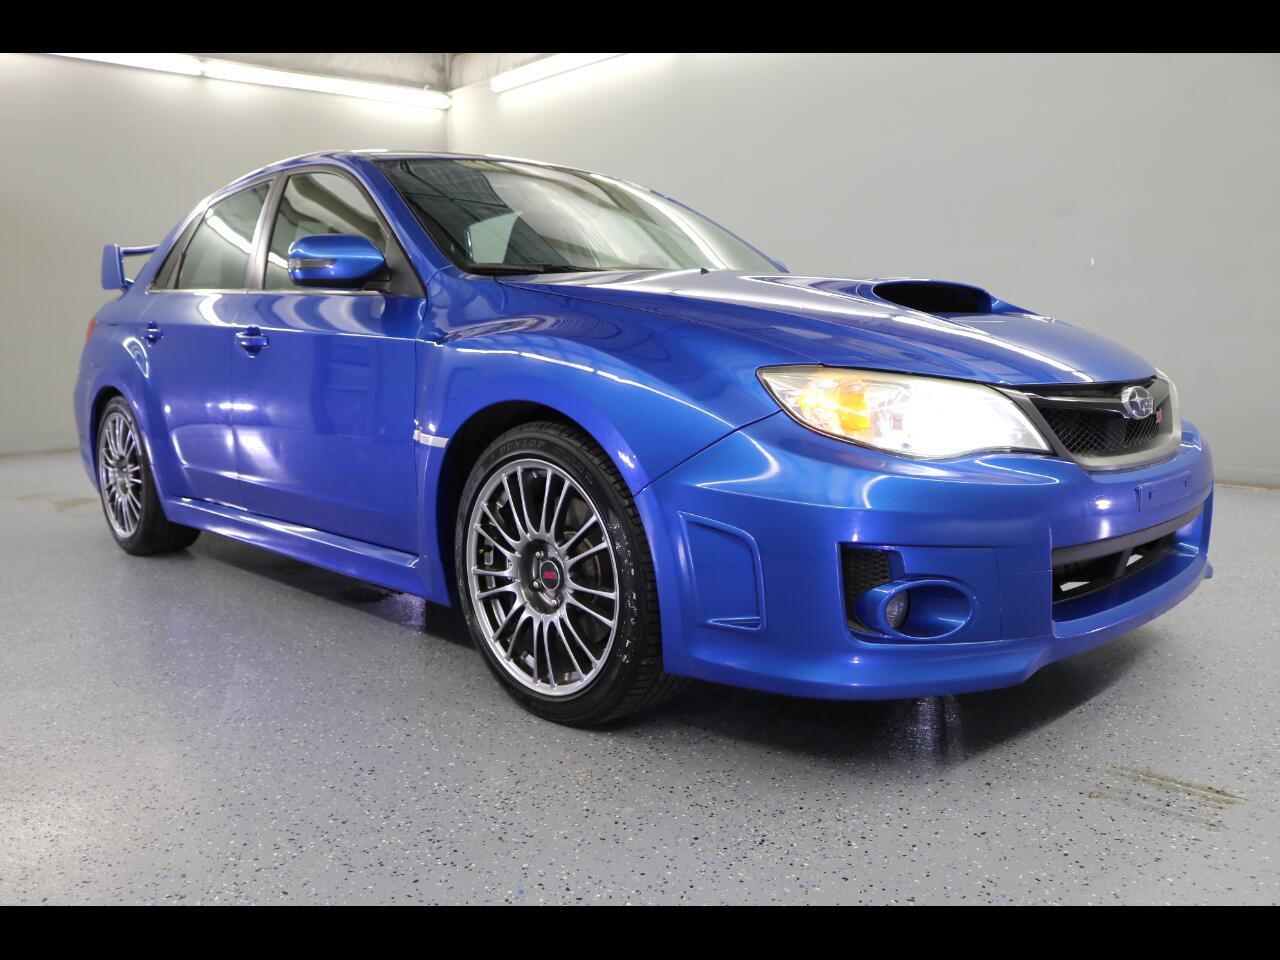 2013 Subaru Impreza Sedan WRX 4dr Man WRX STI Limited